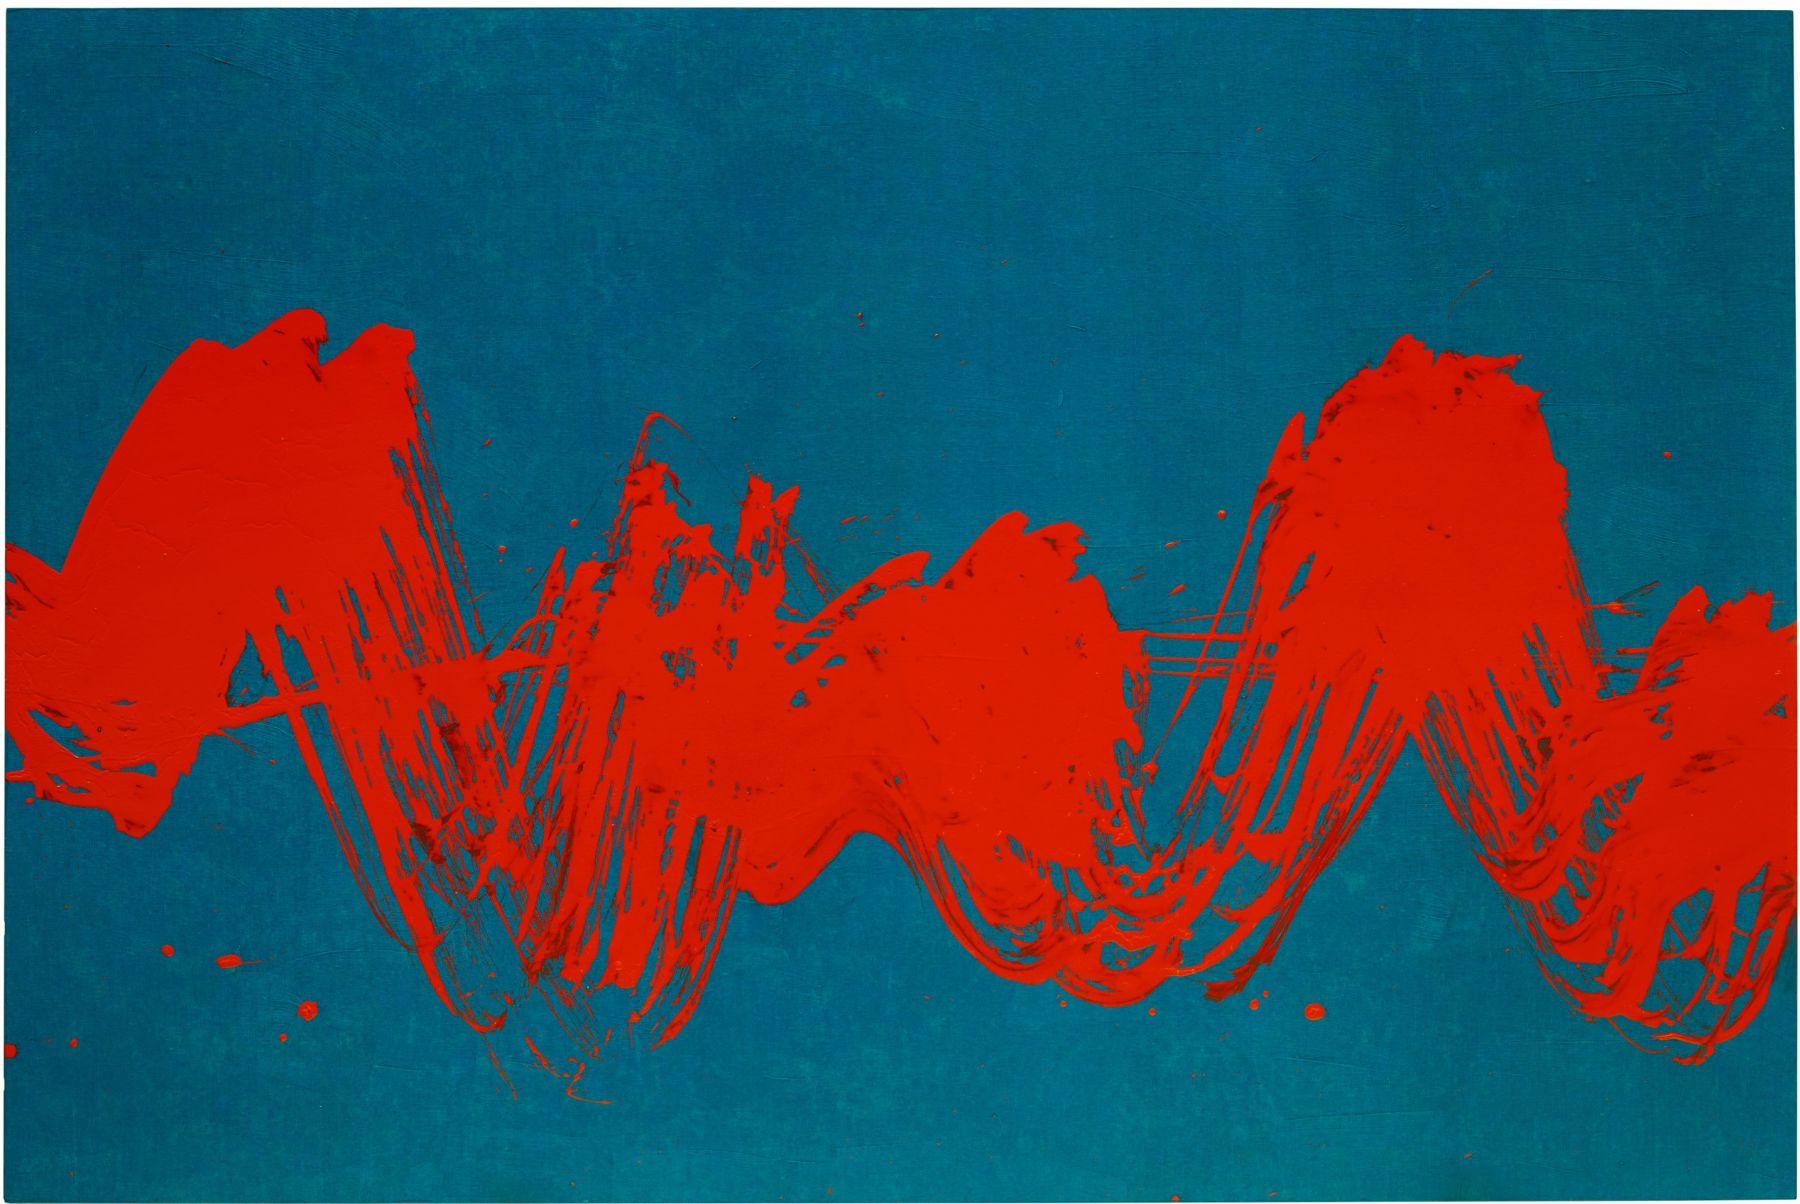 Fabienne Verdier, Intuitive rythm II, 2018